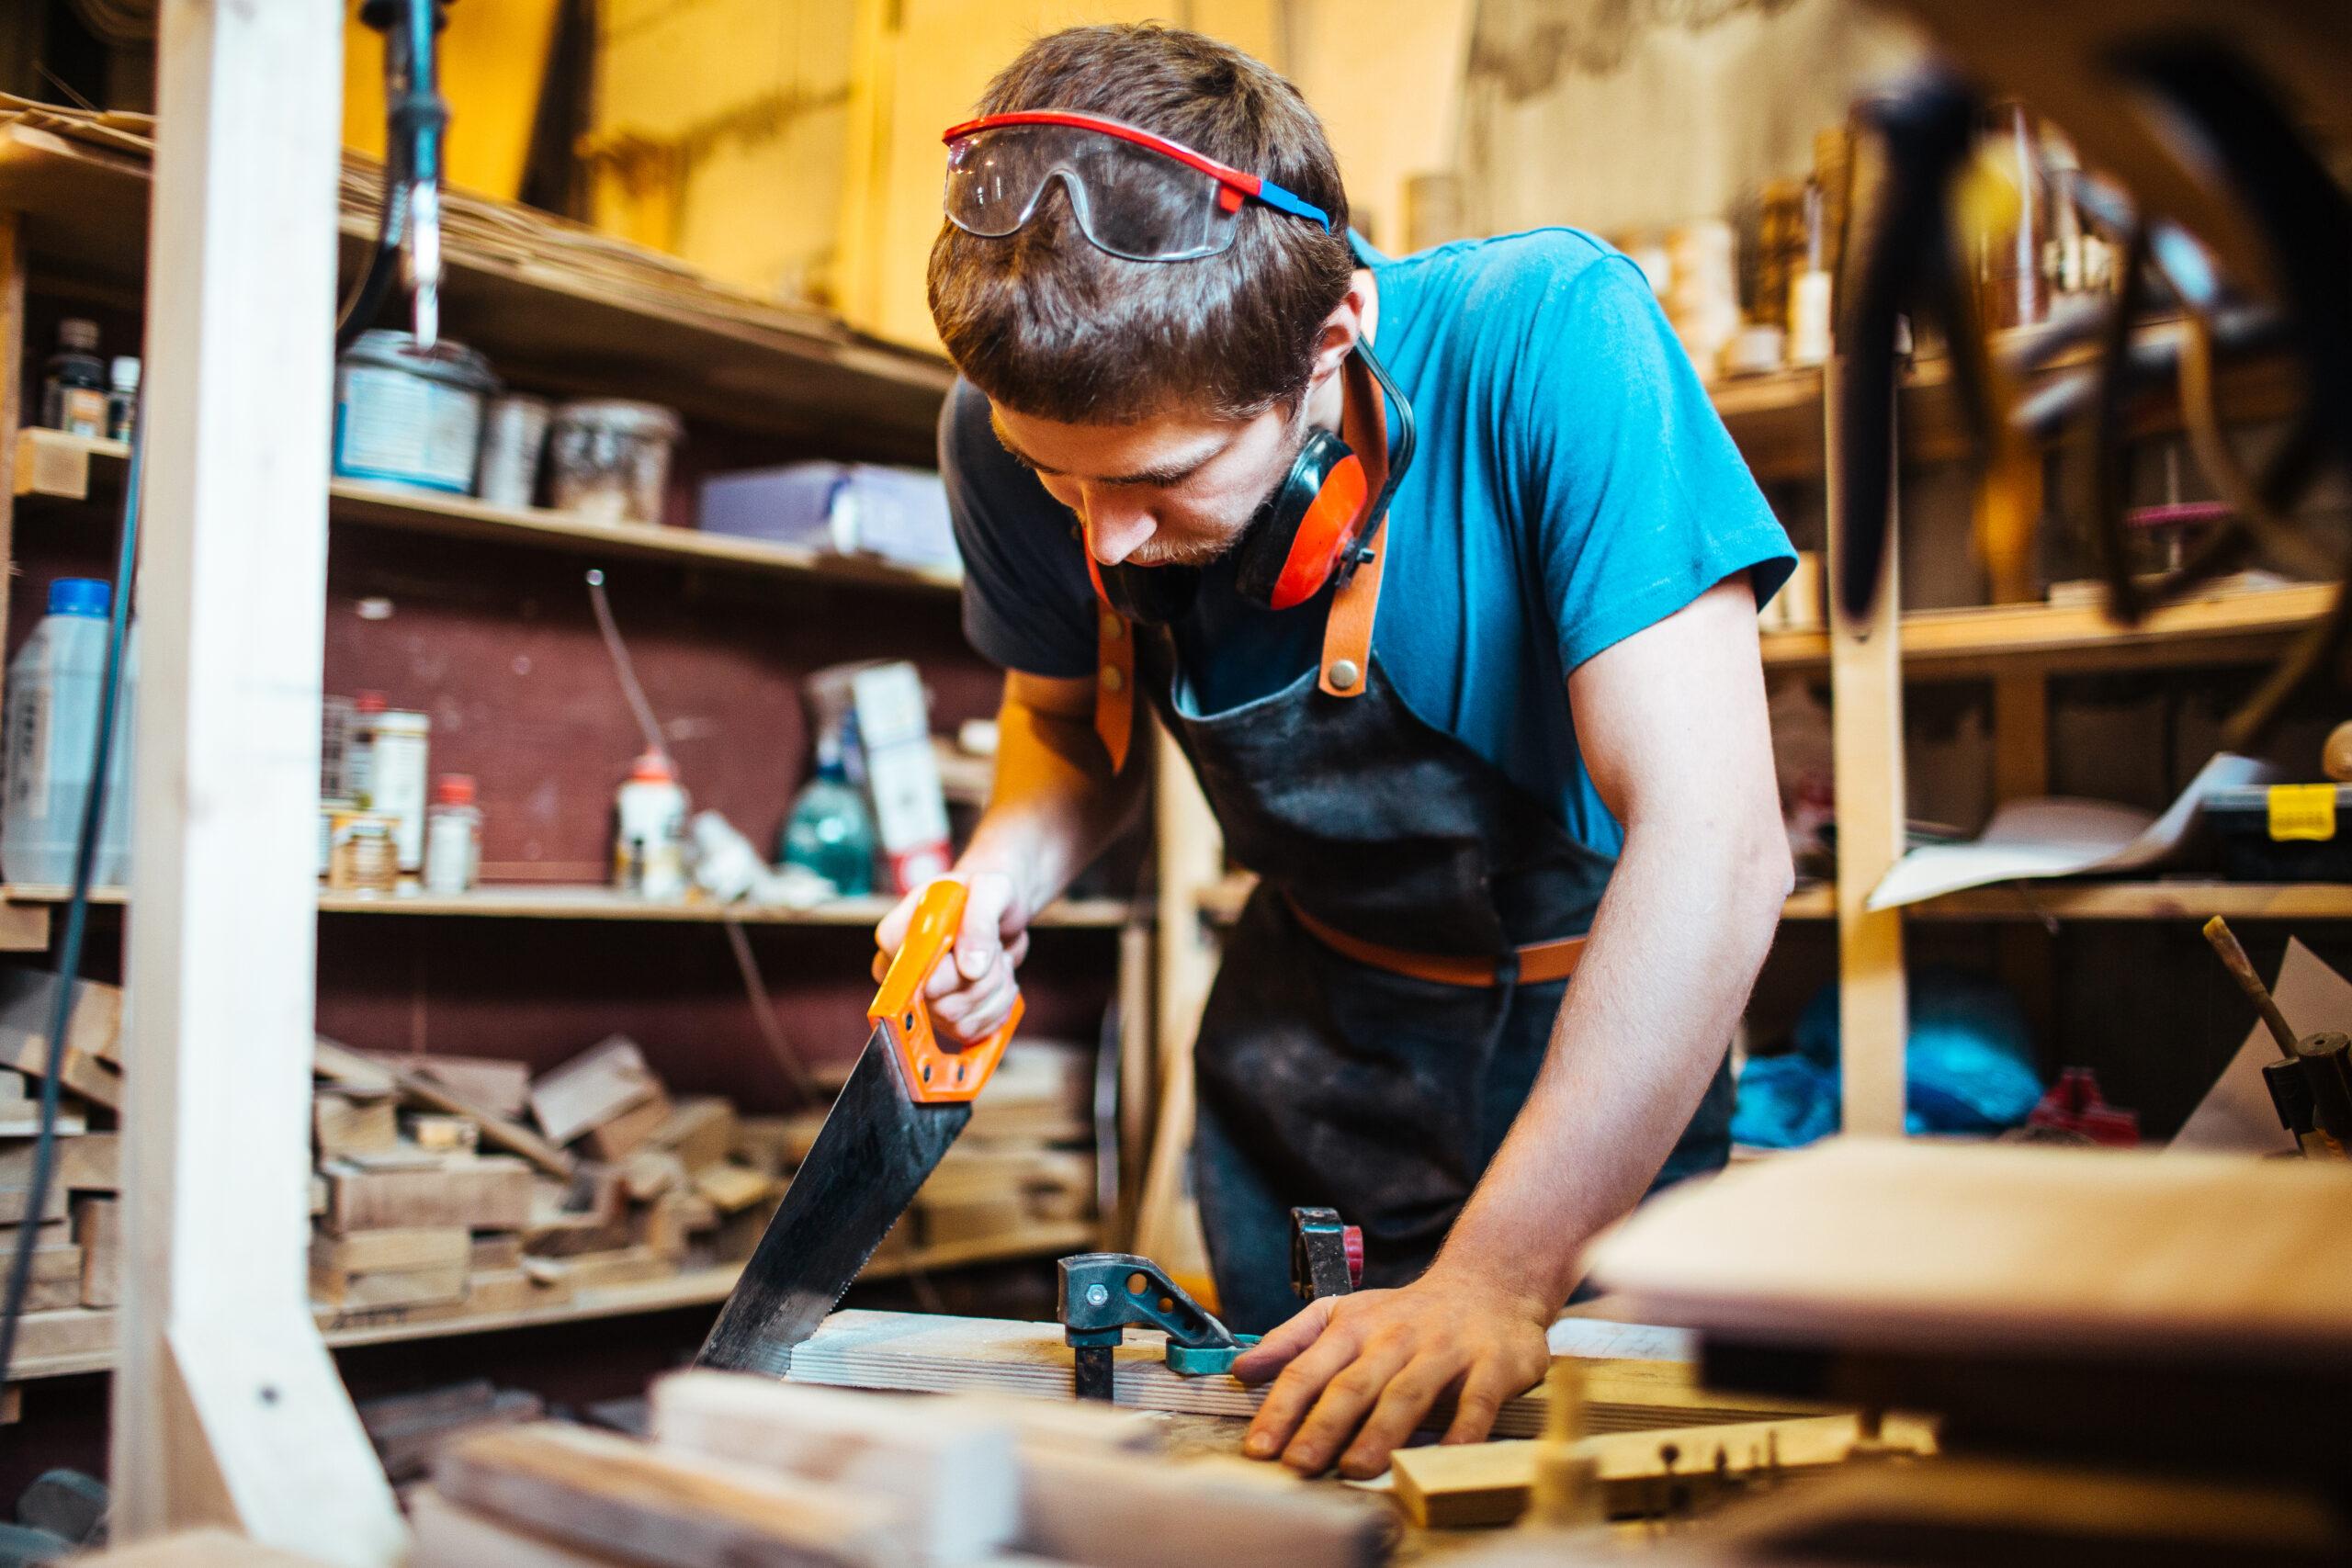 Modern handyman sawing wooden board in his workshop